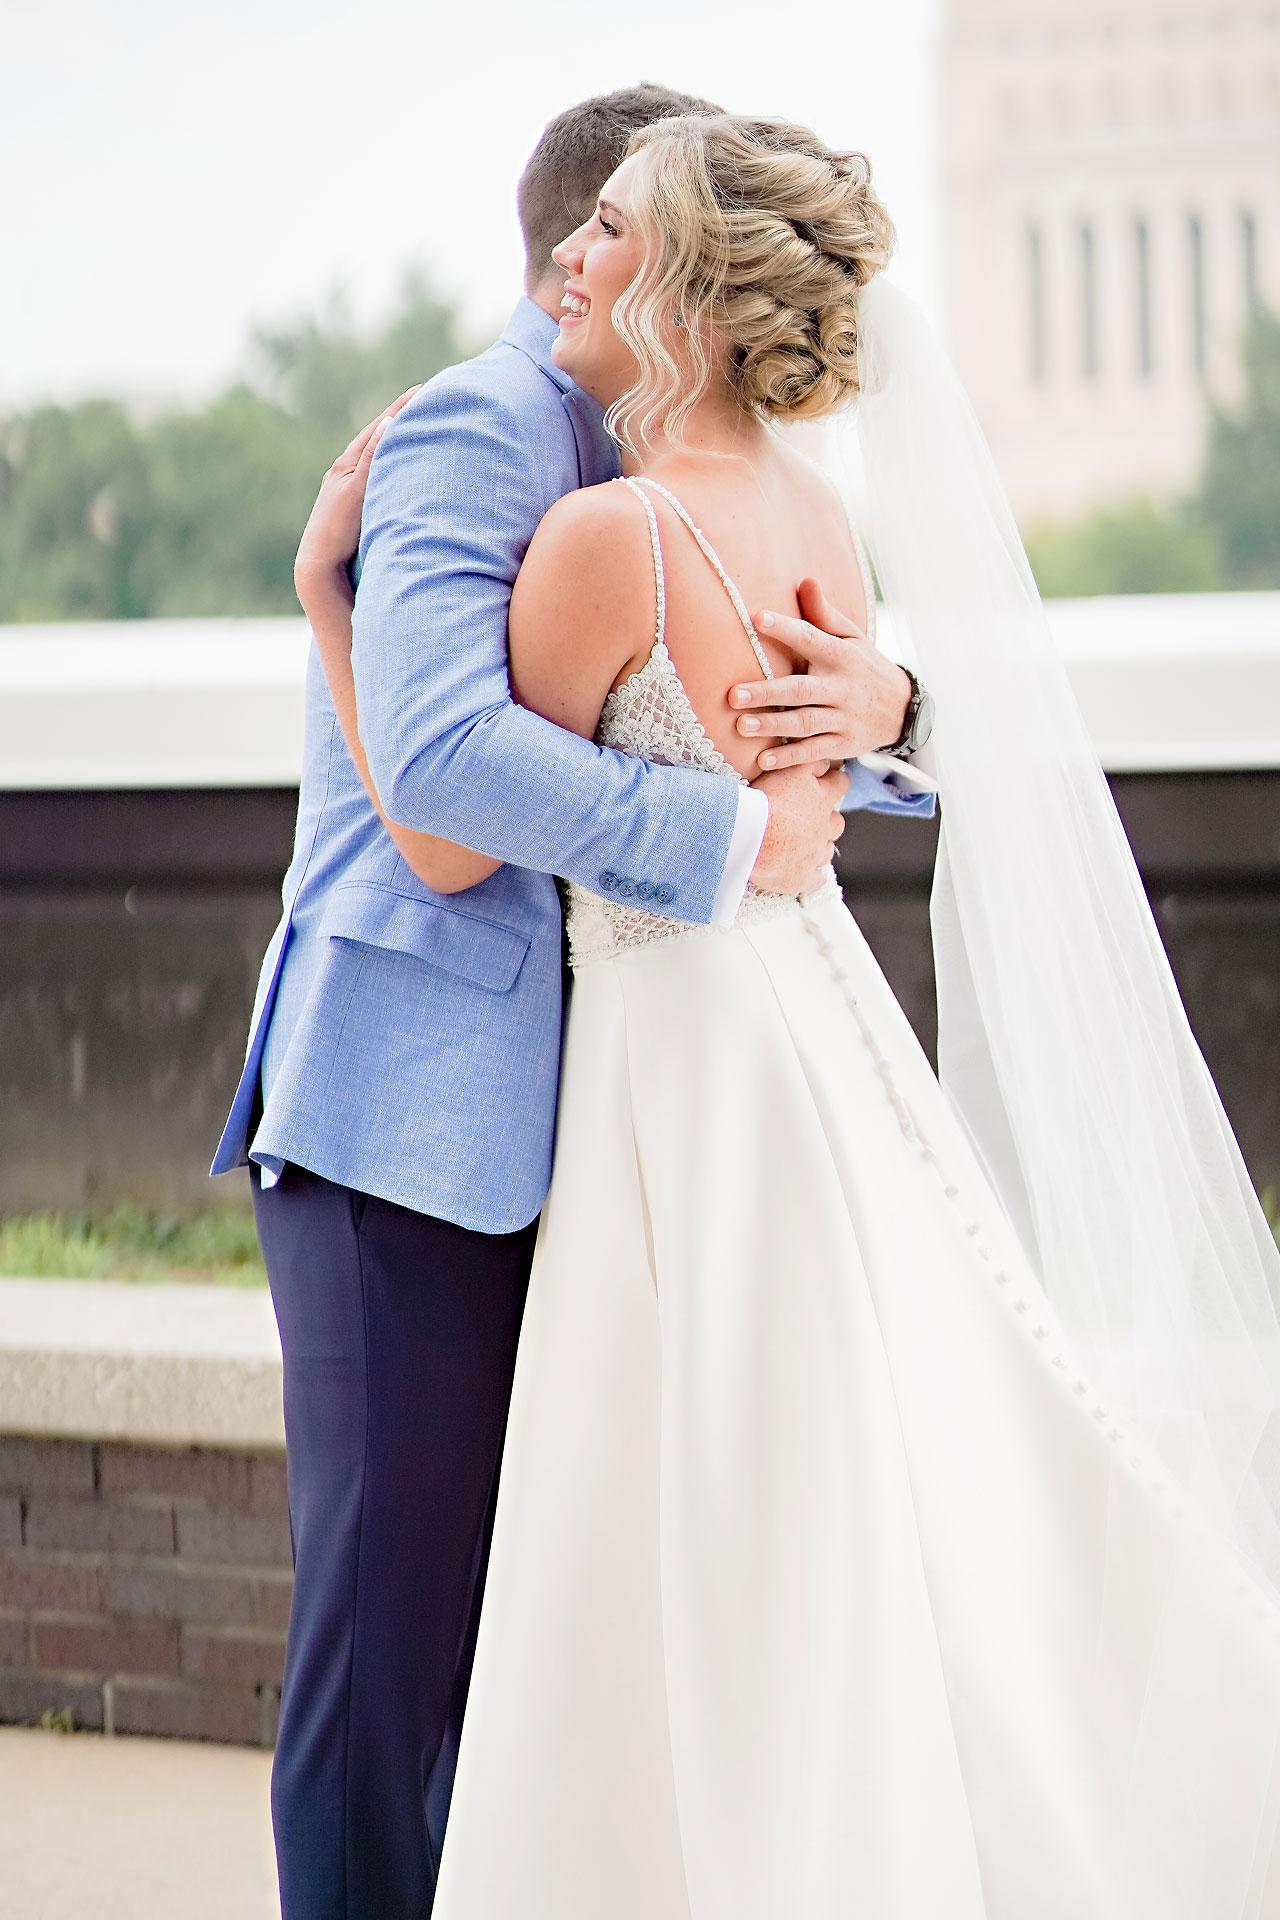 Sammi Jack Regions Tower JPS Events Indianapolis Wedding 055